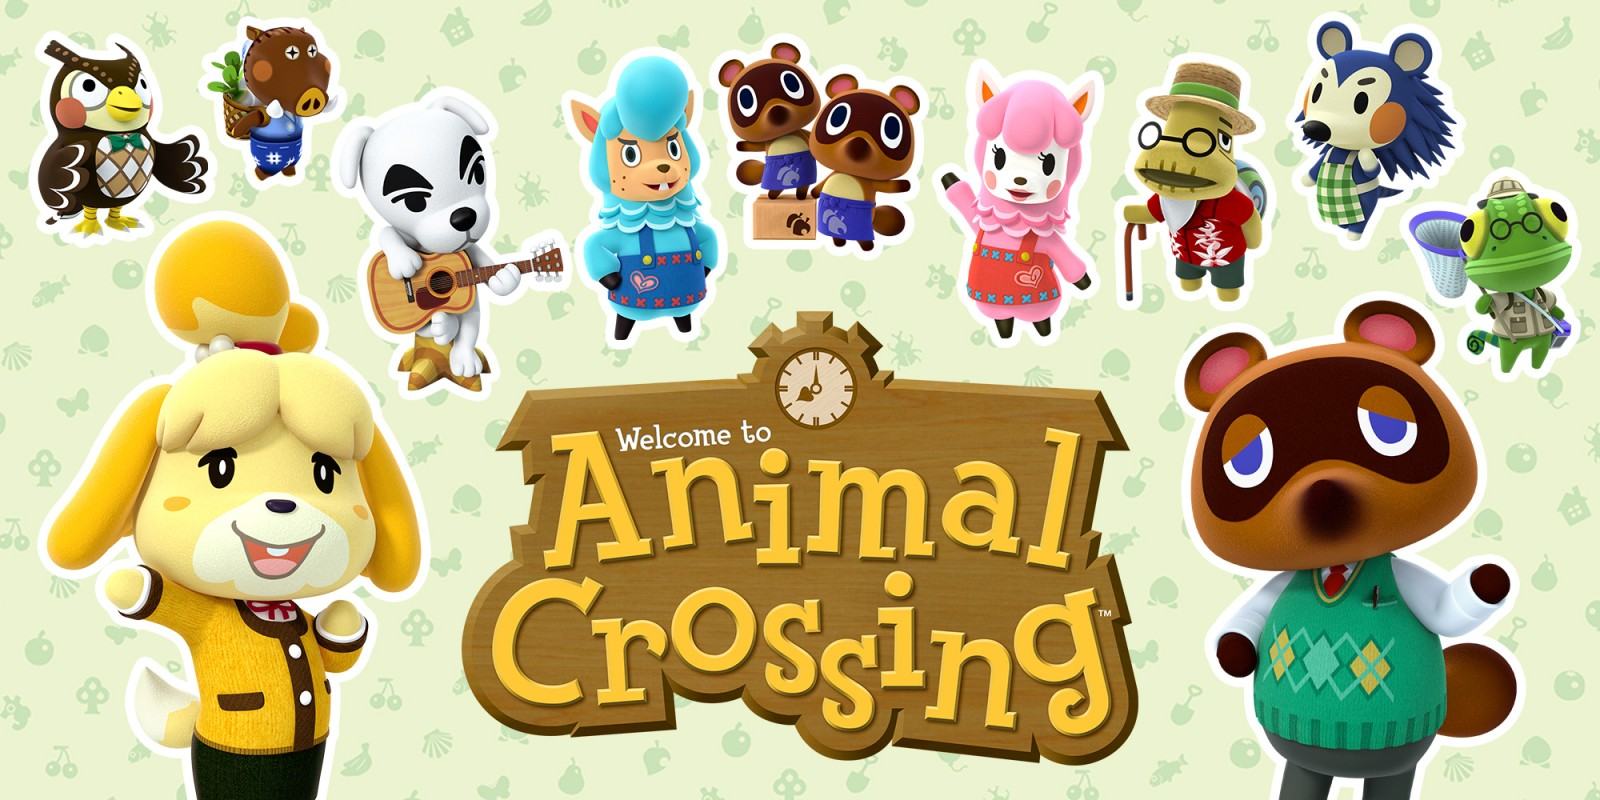 Perché si chiama Animal Crossing?